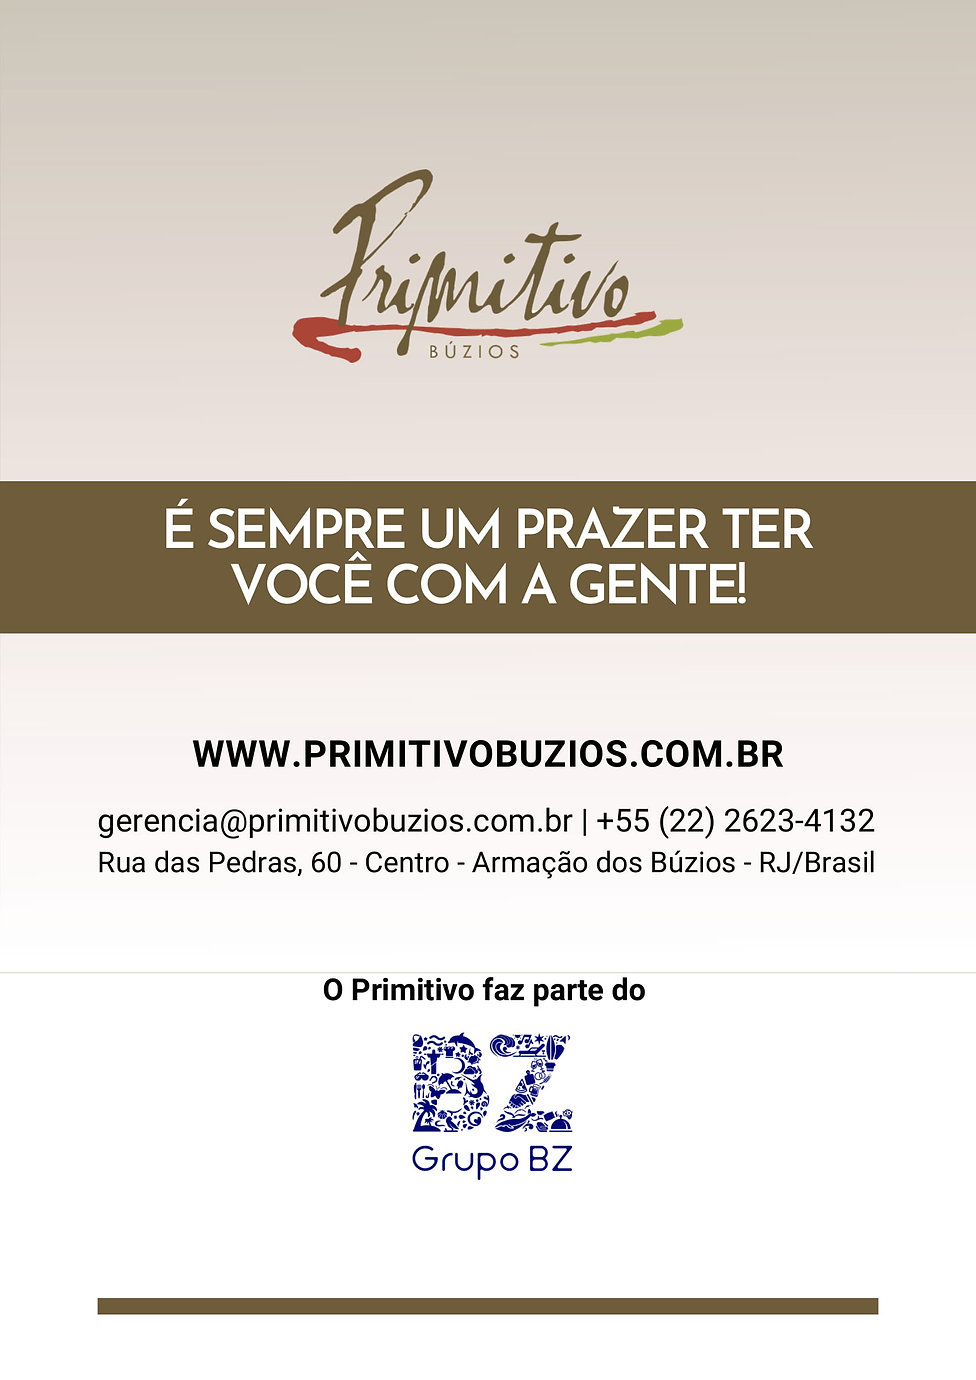 Cartilha CORONAVÍRUS_Primitivo-5.jpg